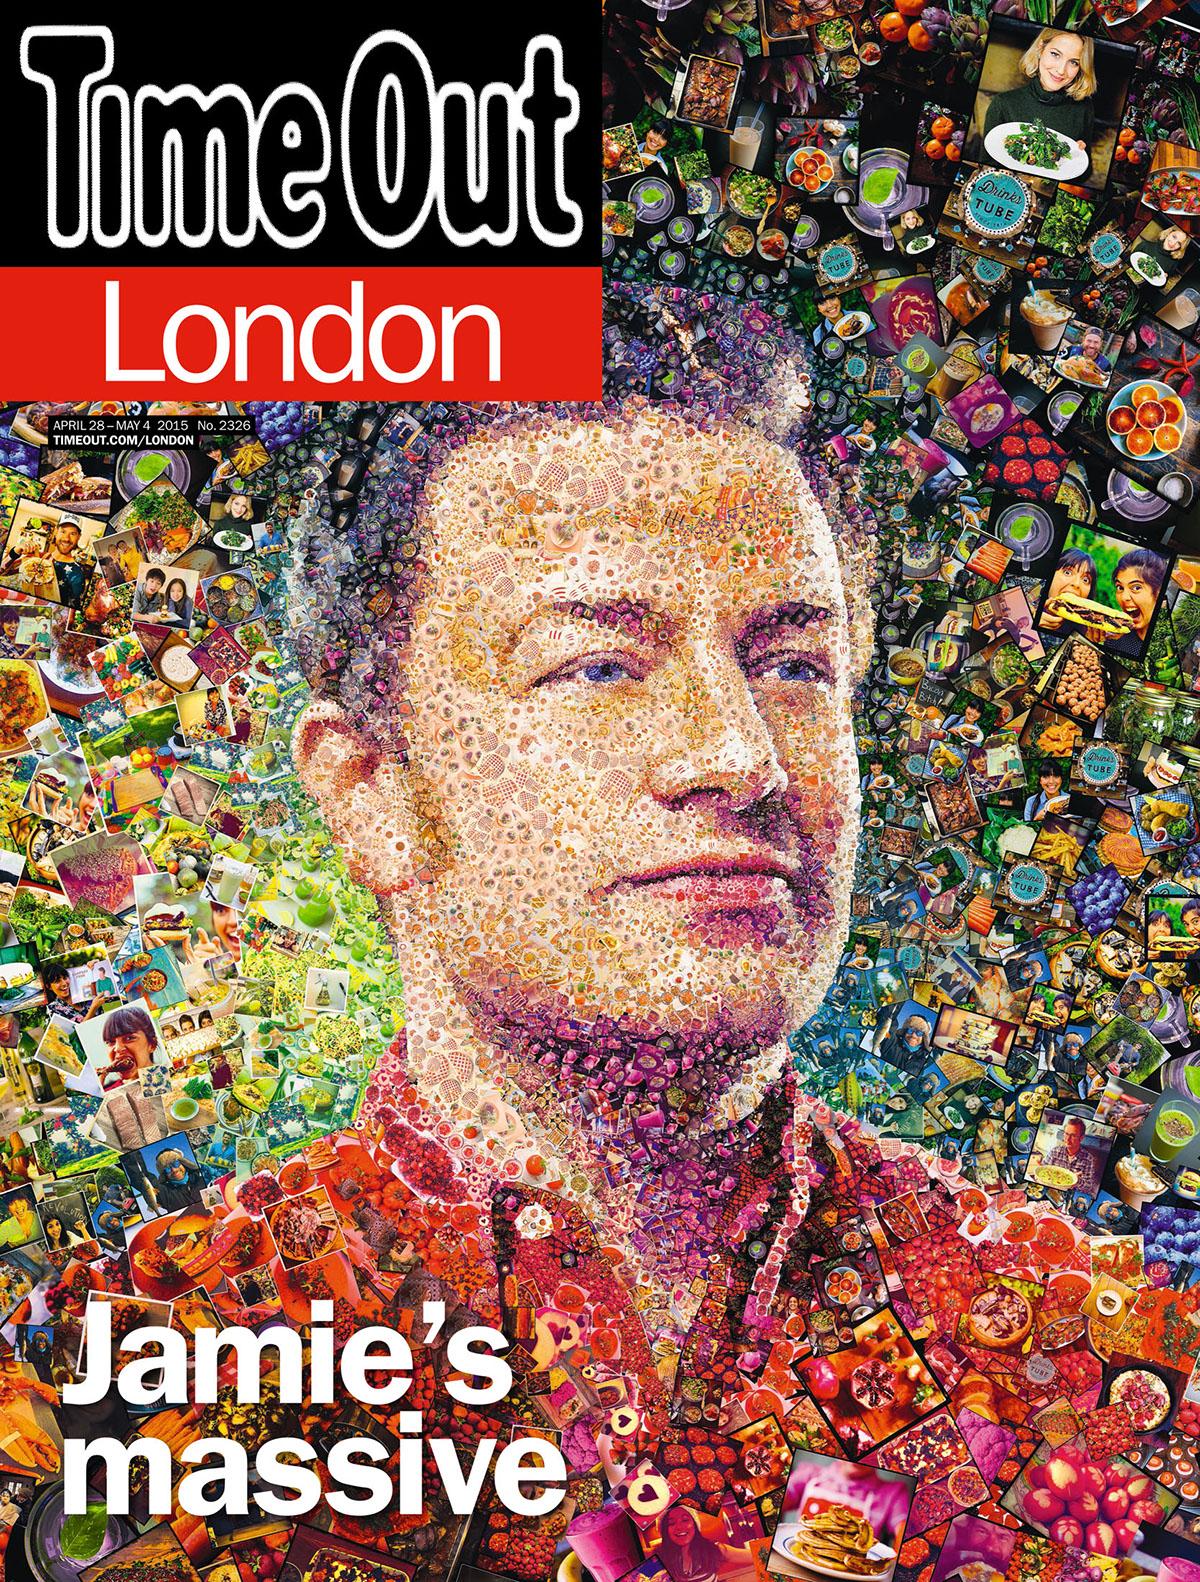 photomosaic collage Graphic designs portrait puzzle science Technology arts magazine newspaper